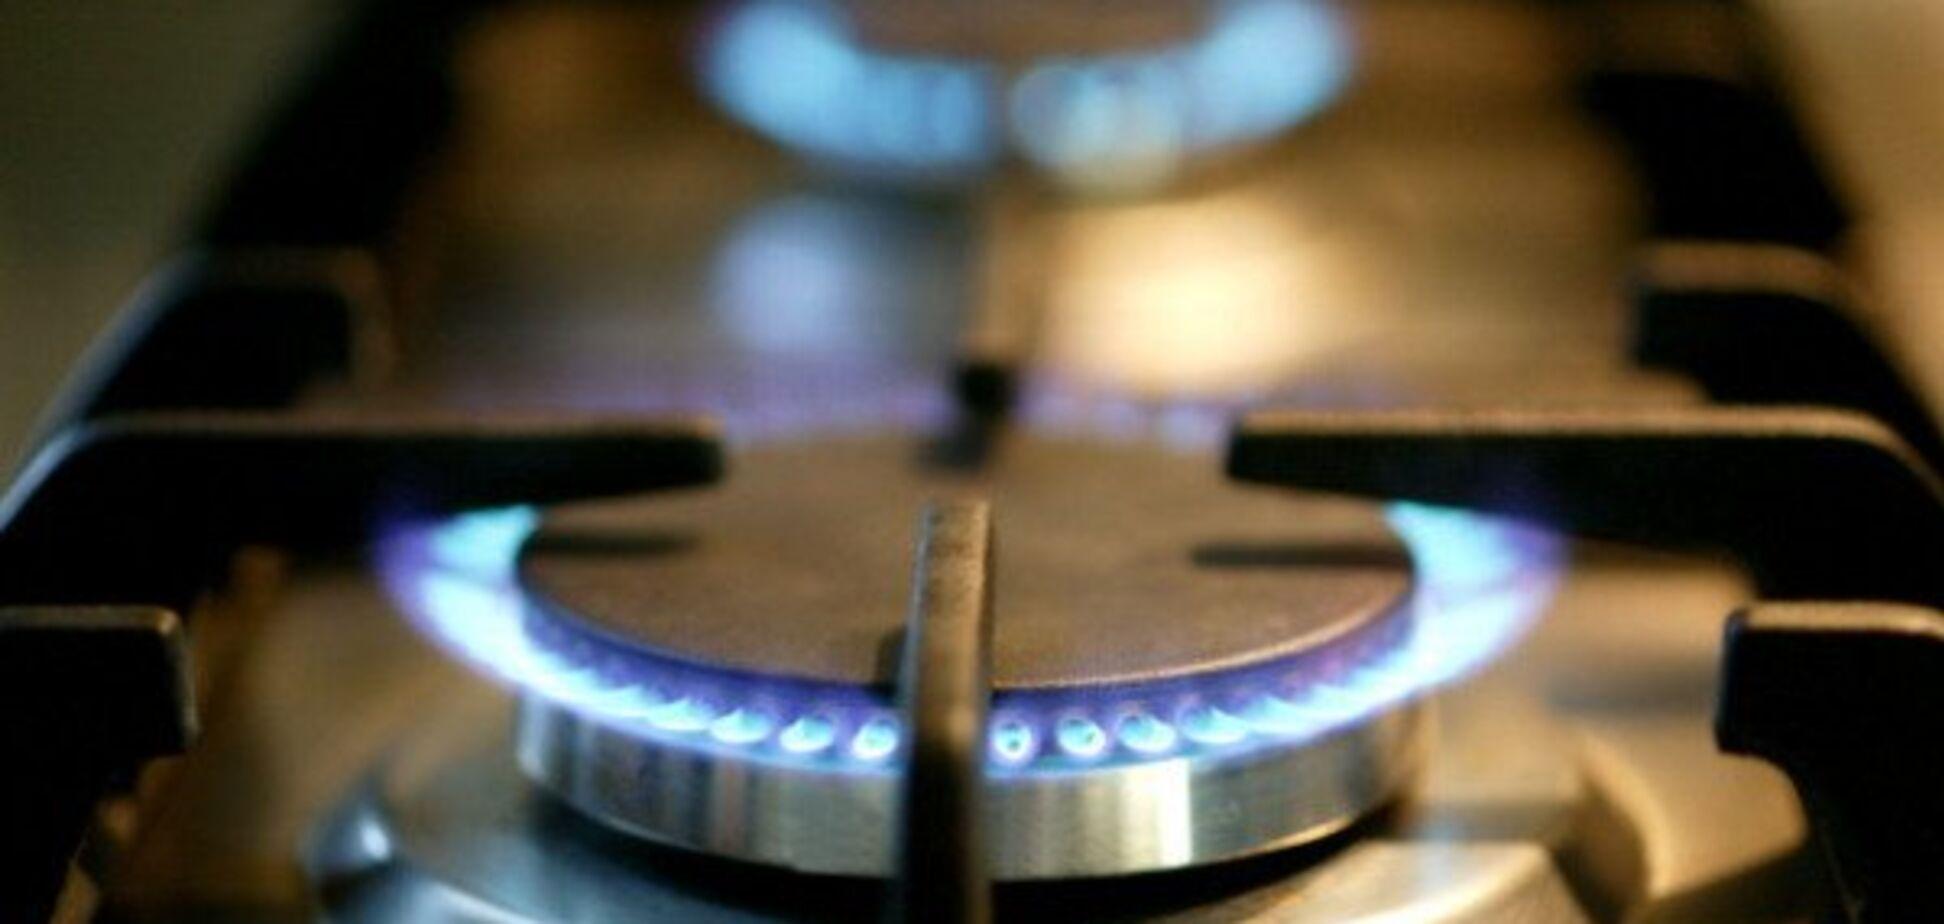 Украина пообещала МВФ новое повышение цен на газ